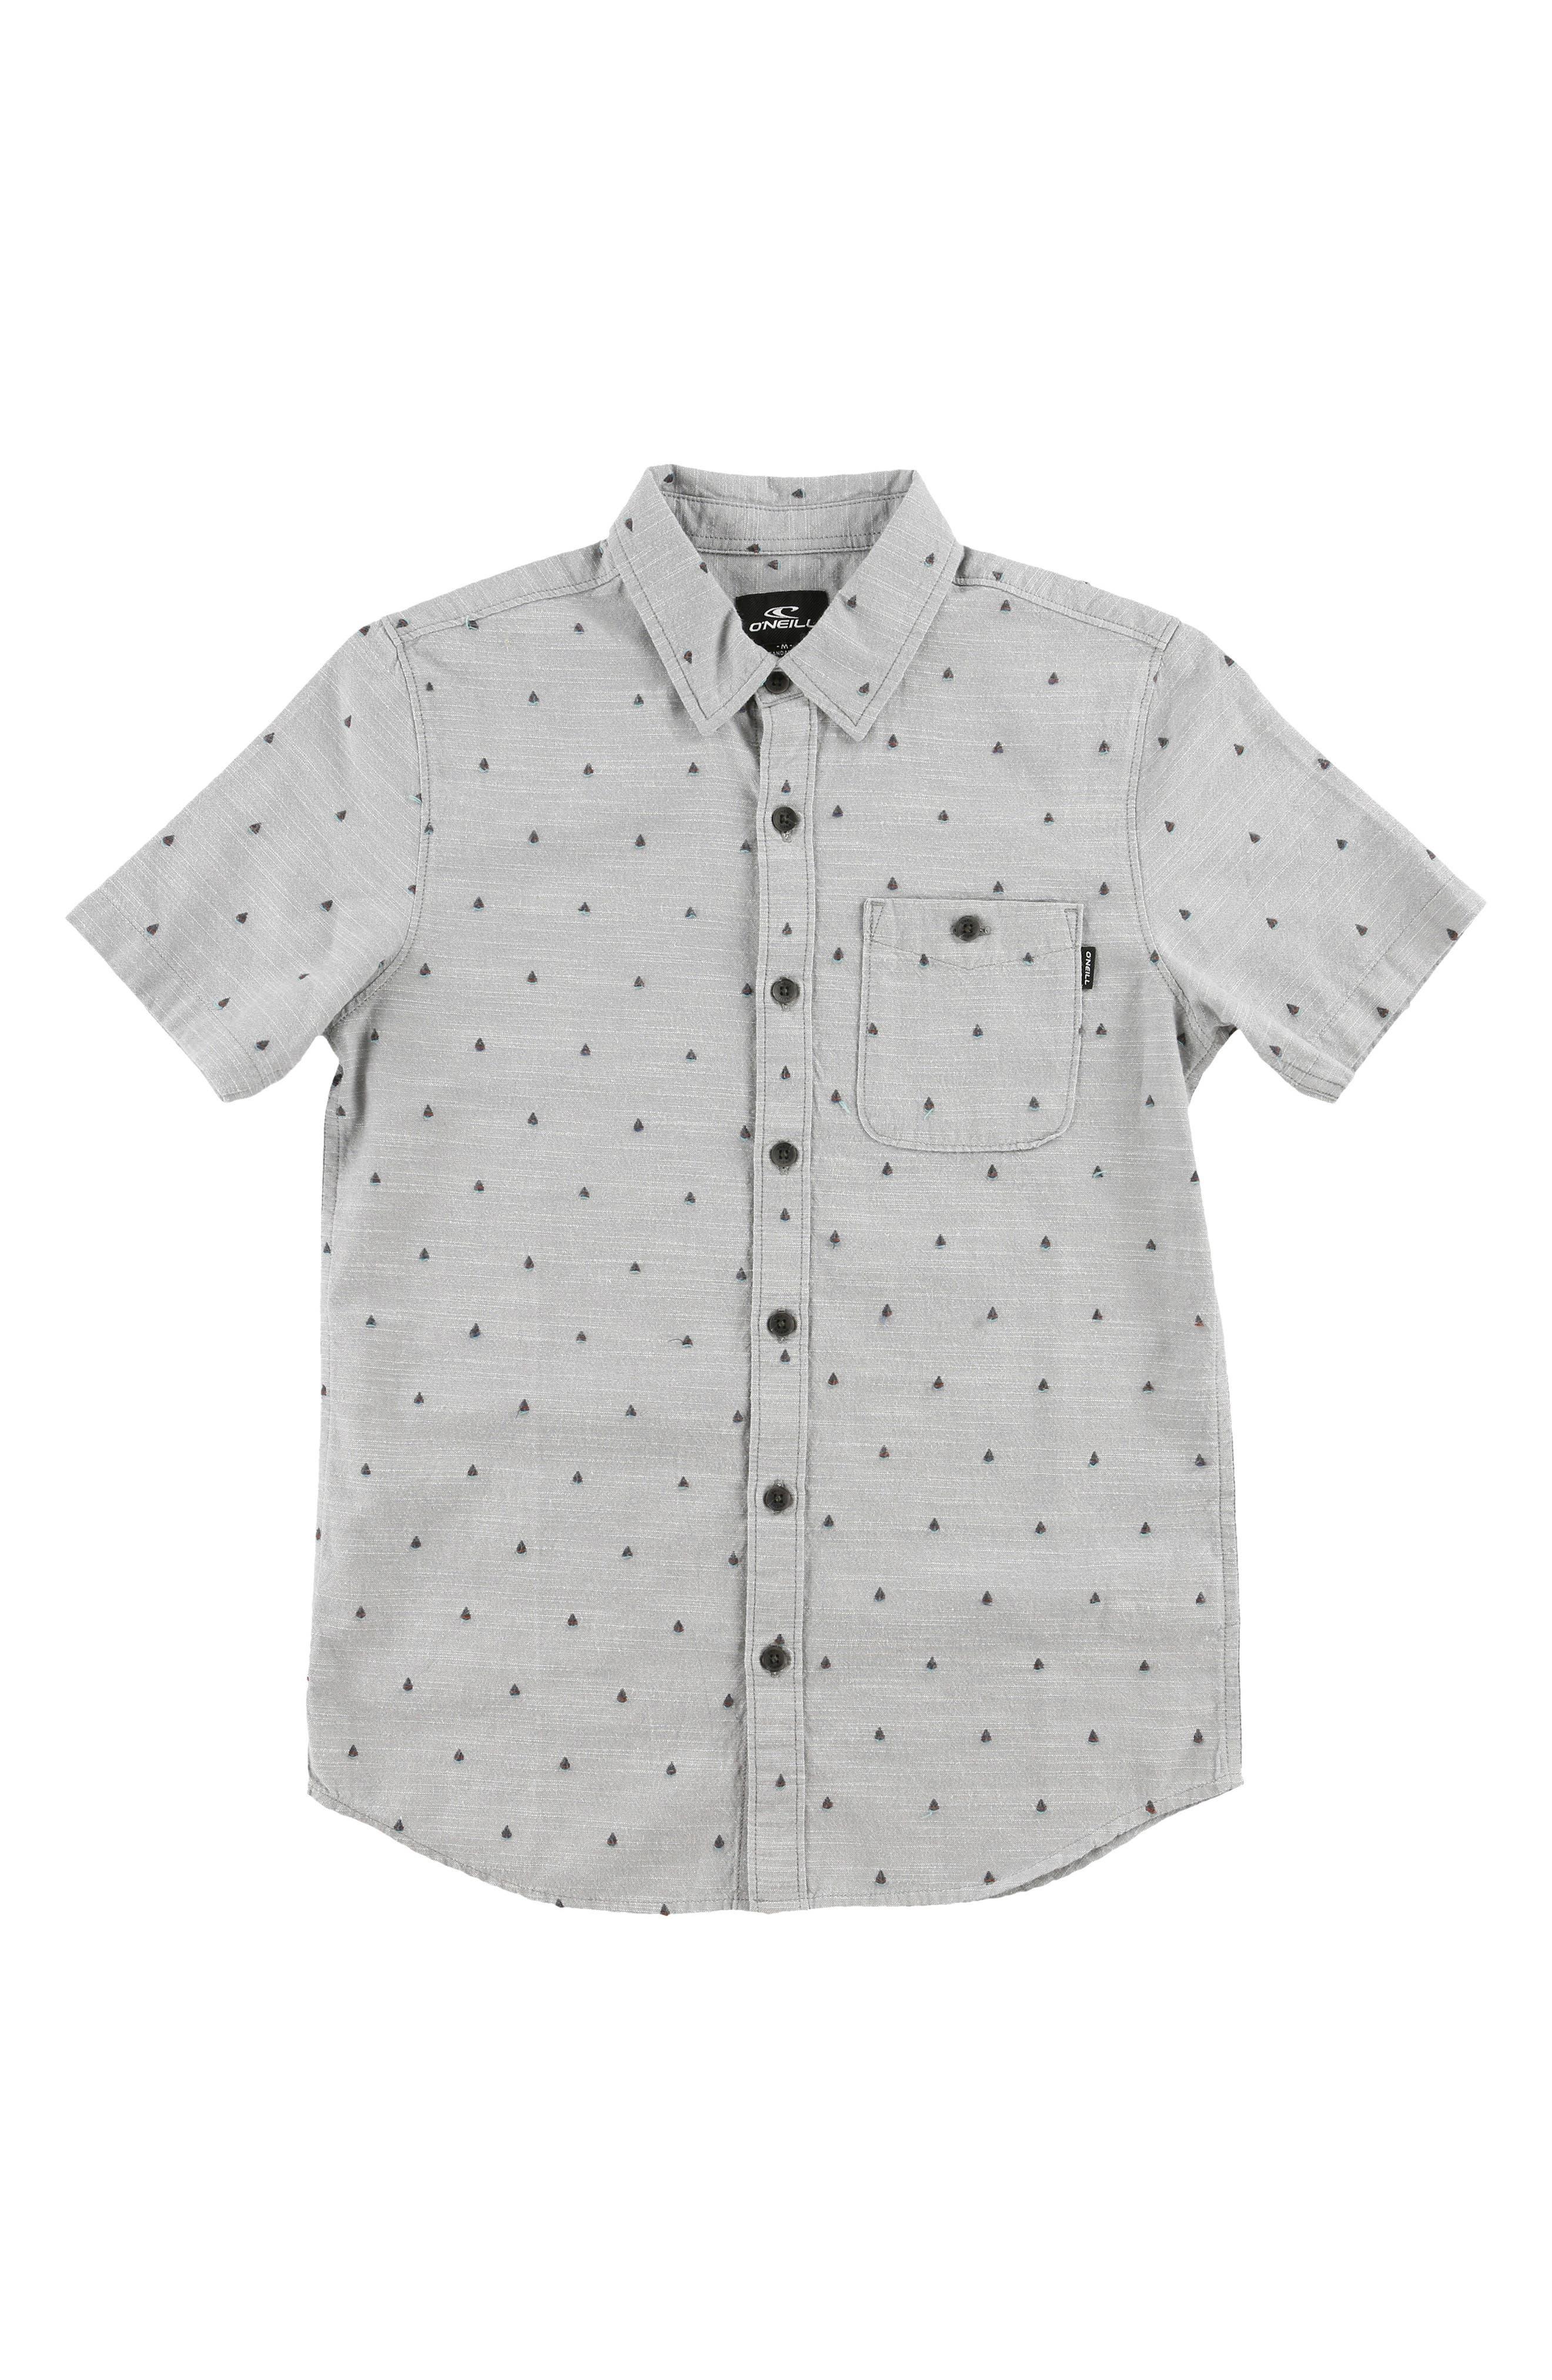 O'NEILL Woods Woven Shirt, Main, color, GREY